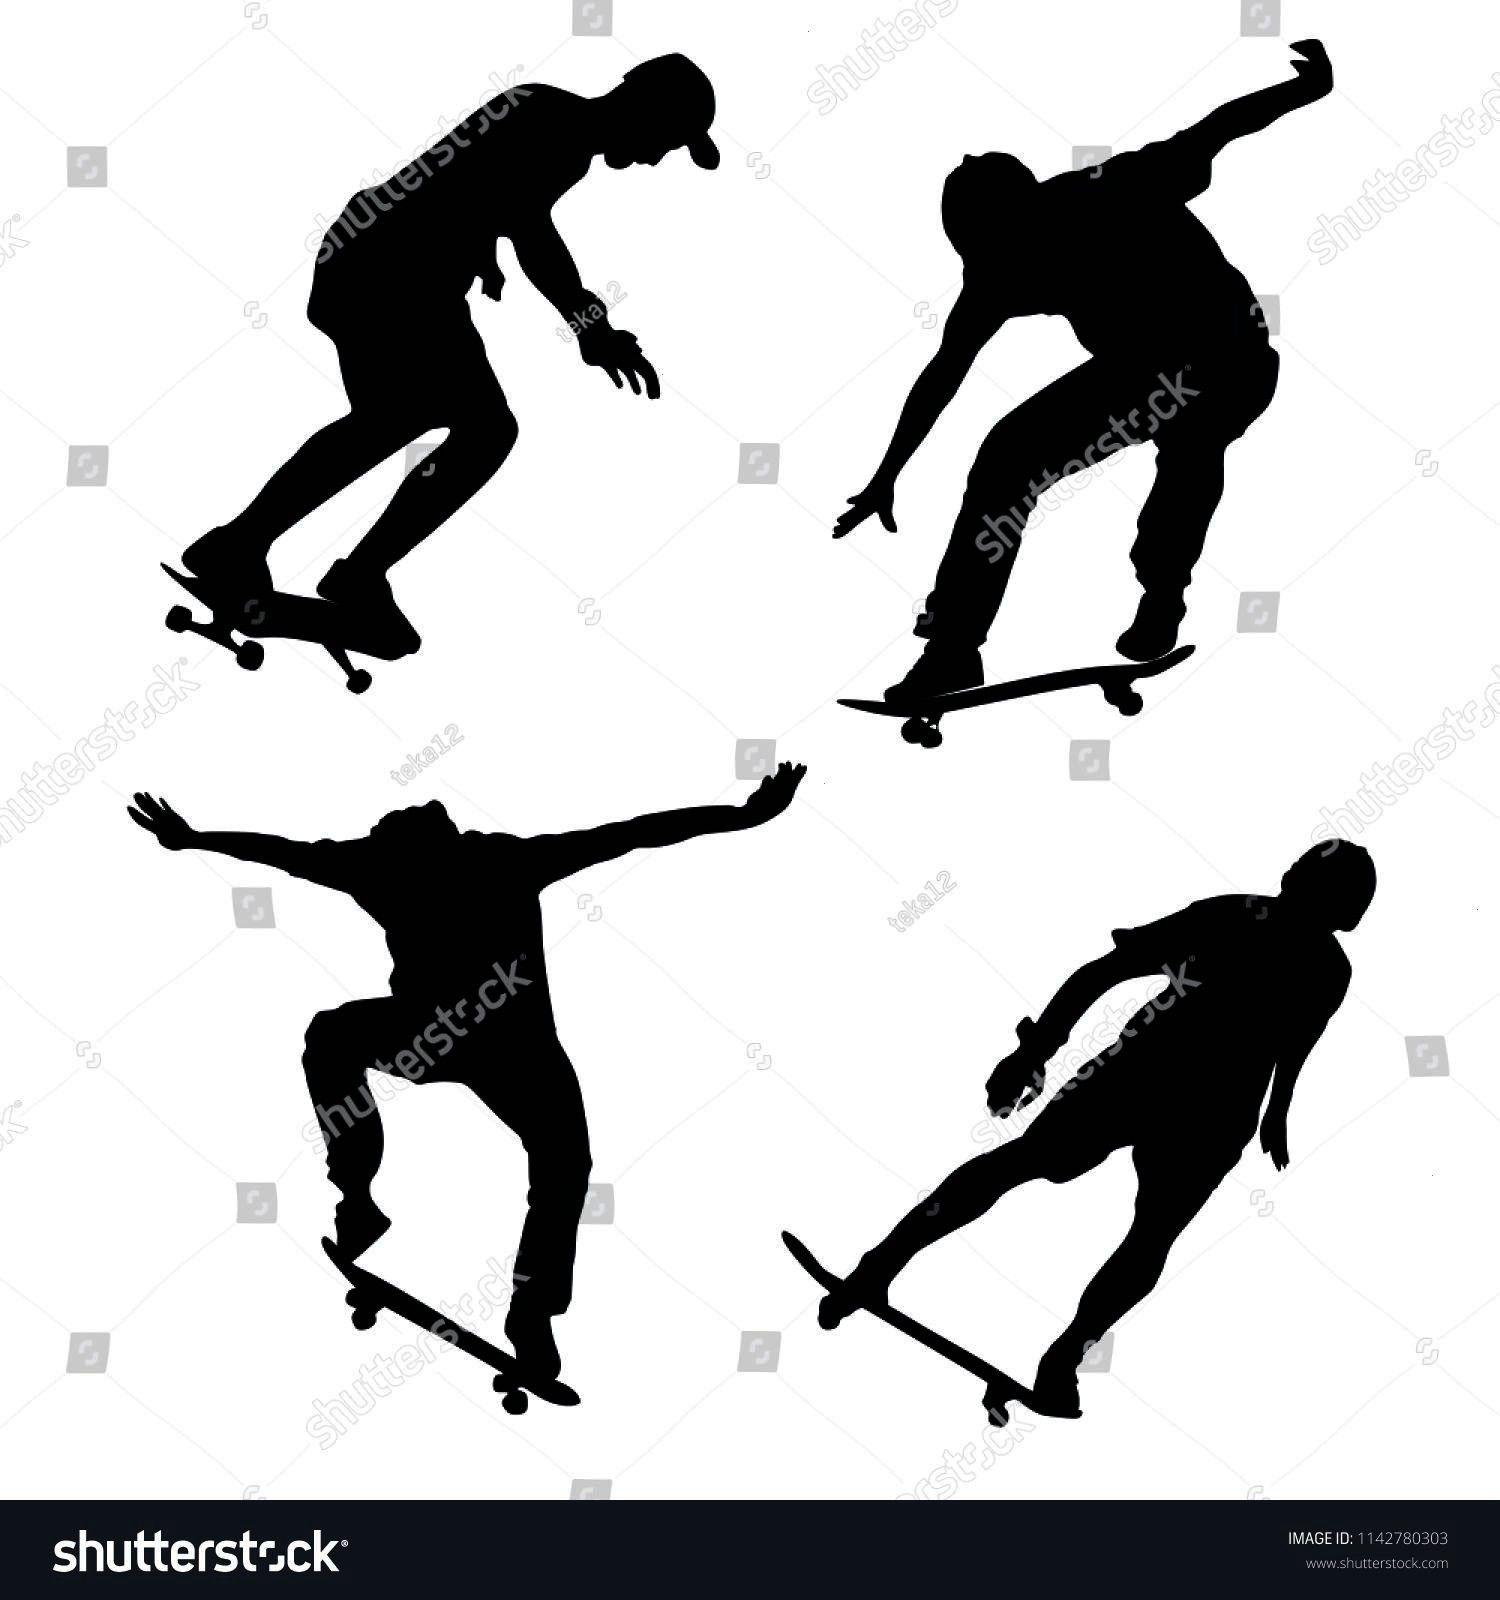 game, skateboarder in skate park, air jump trick. Skateboard vecto...,  Extreme sport game, skatebo